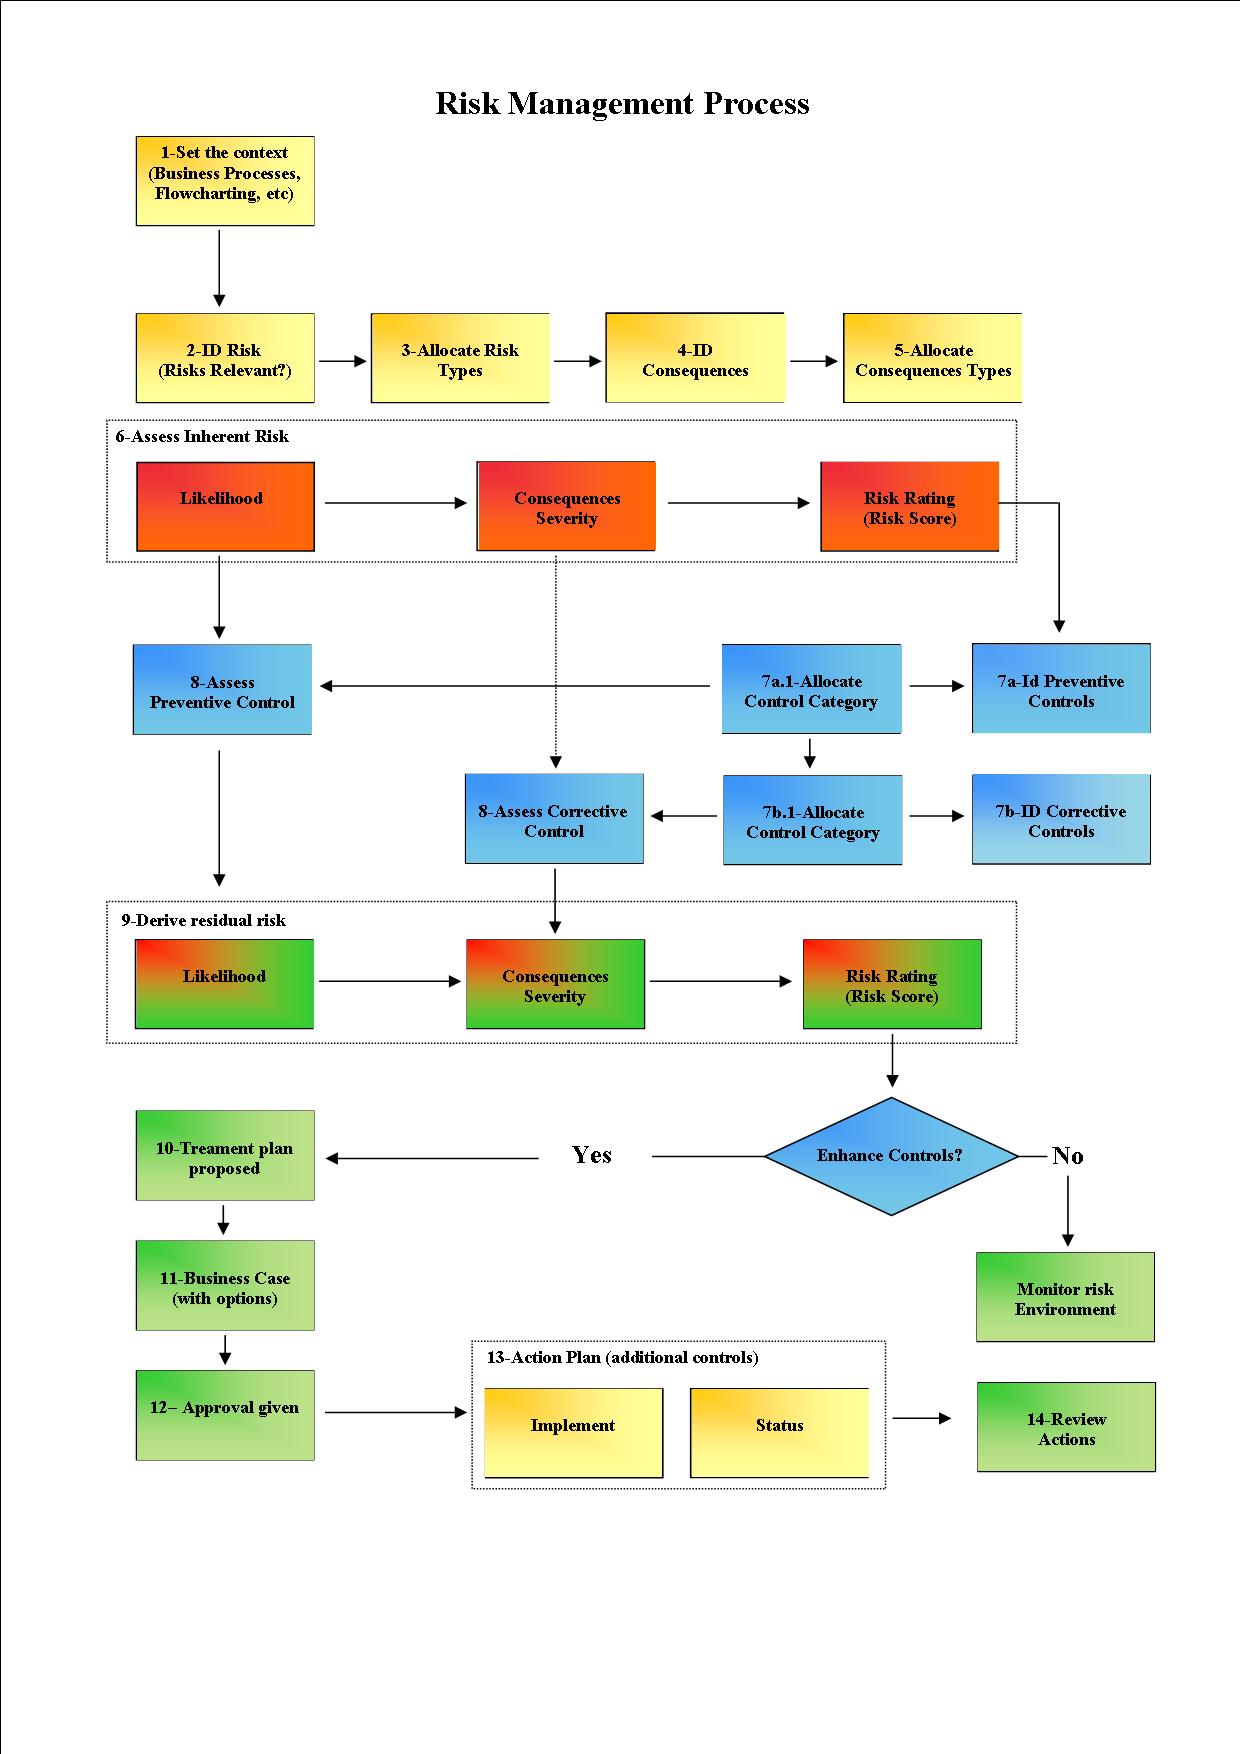 Reference CorprofitCom ND Risk Management Process Image